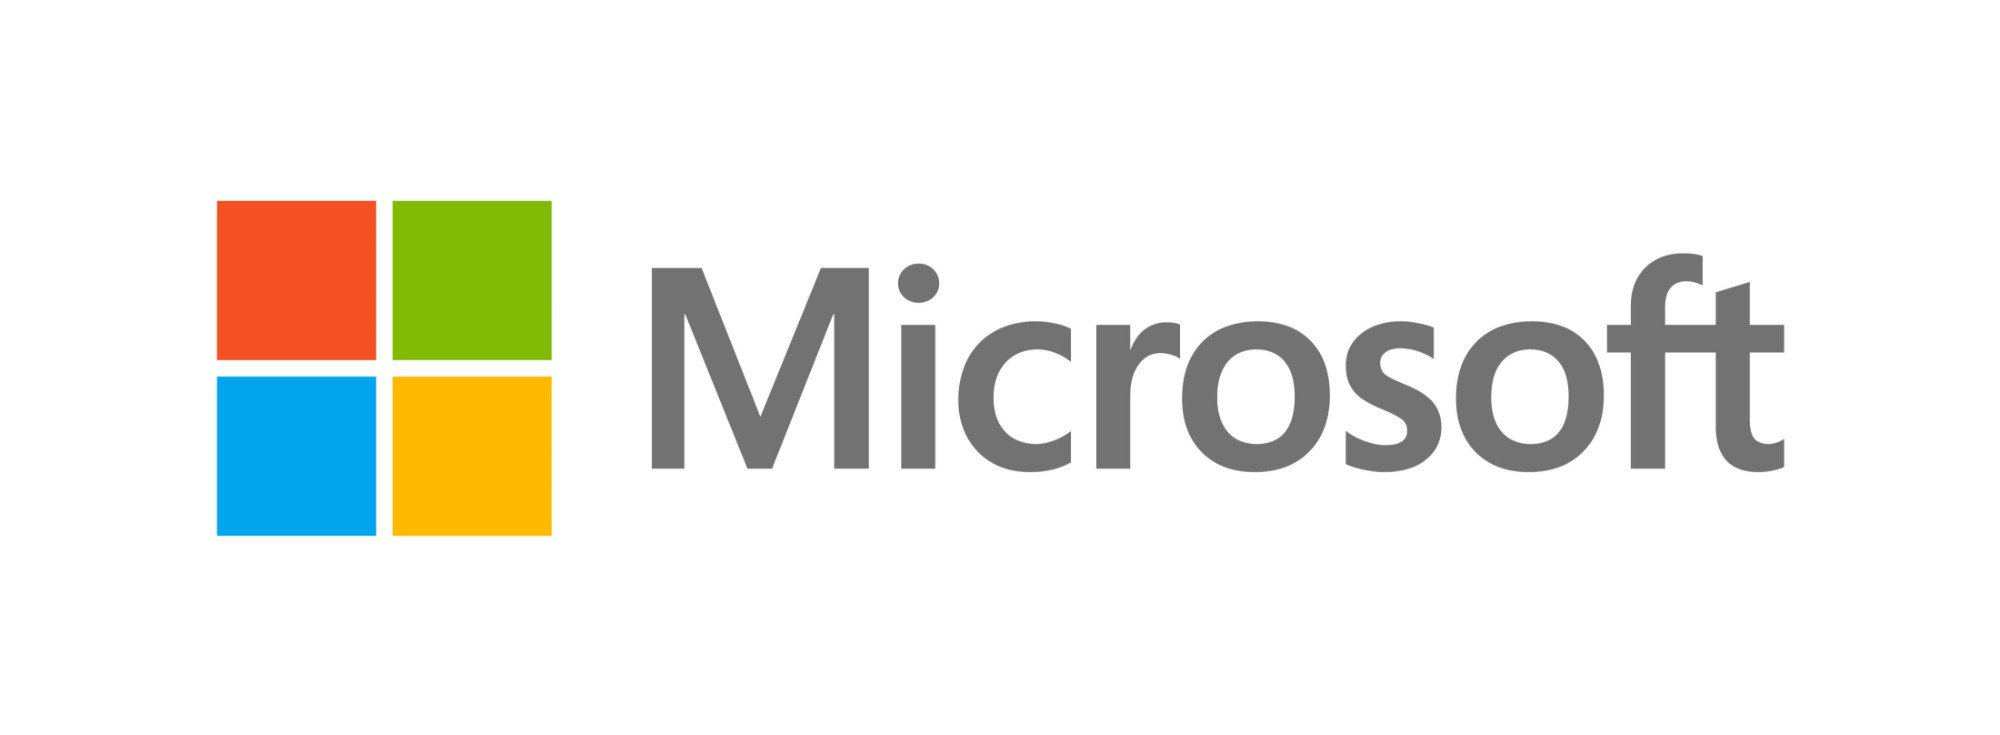 Microsoft Office 365 Business Premium 1 licenses 1 years English